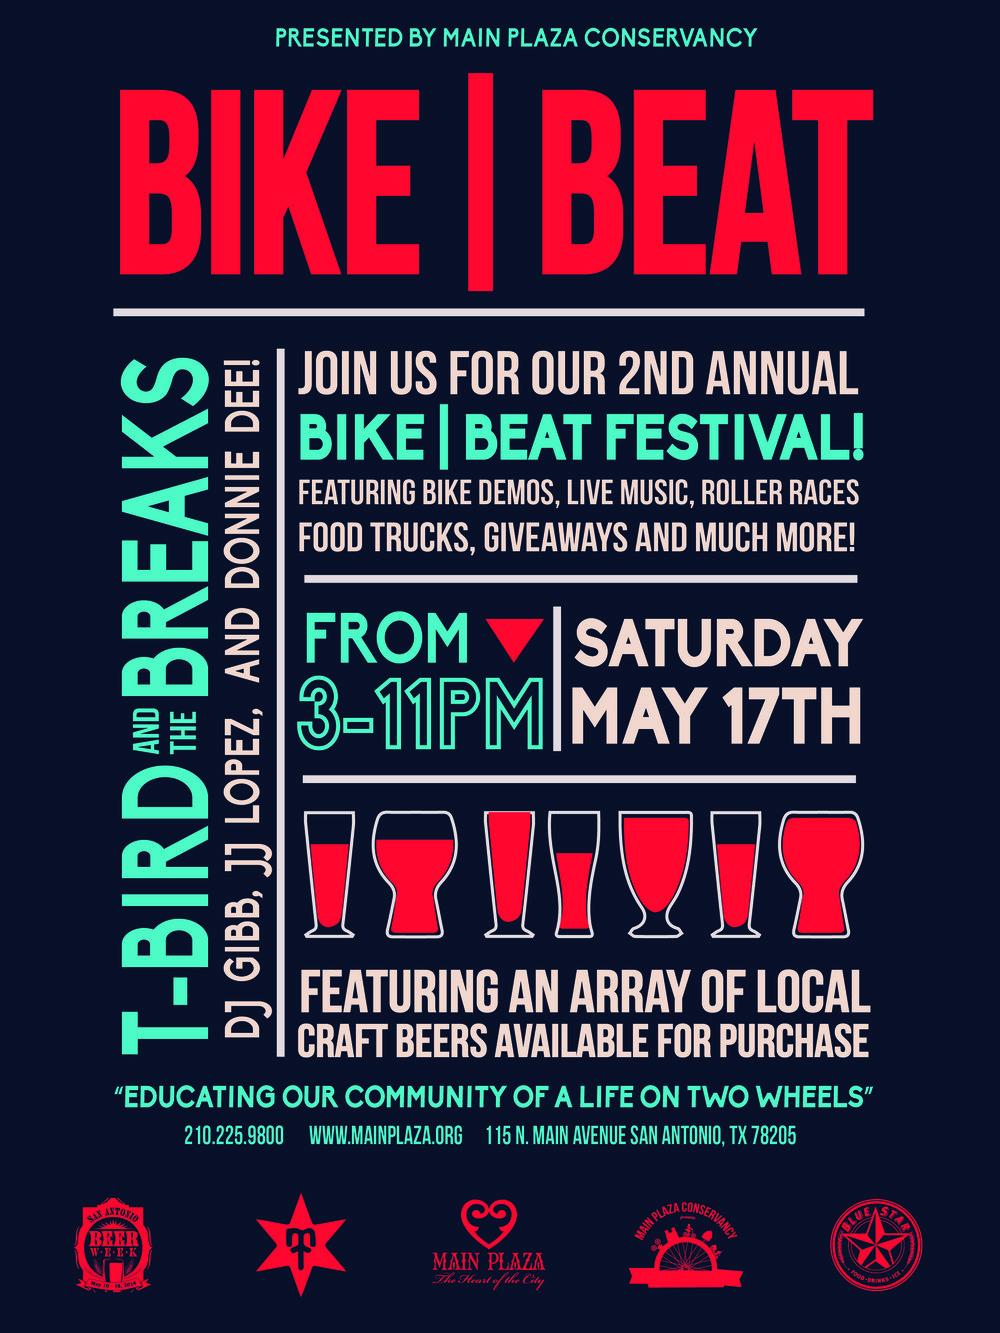 Bike_Beat Poster2-01.jpg